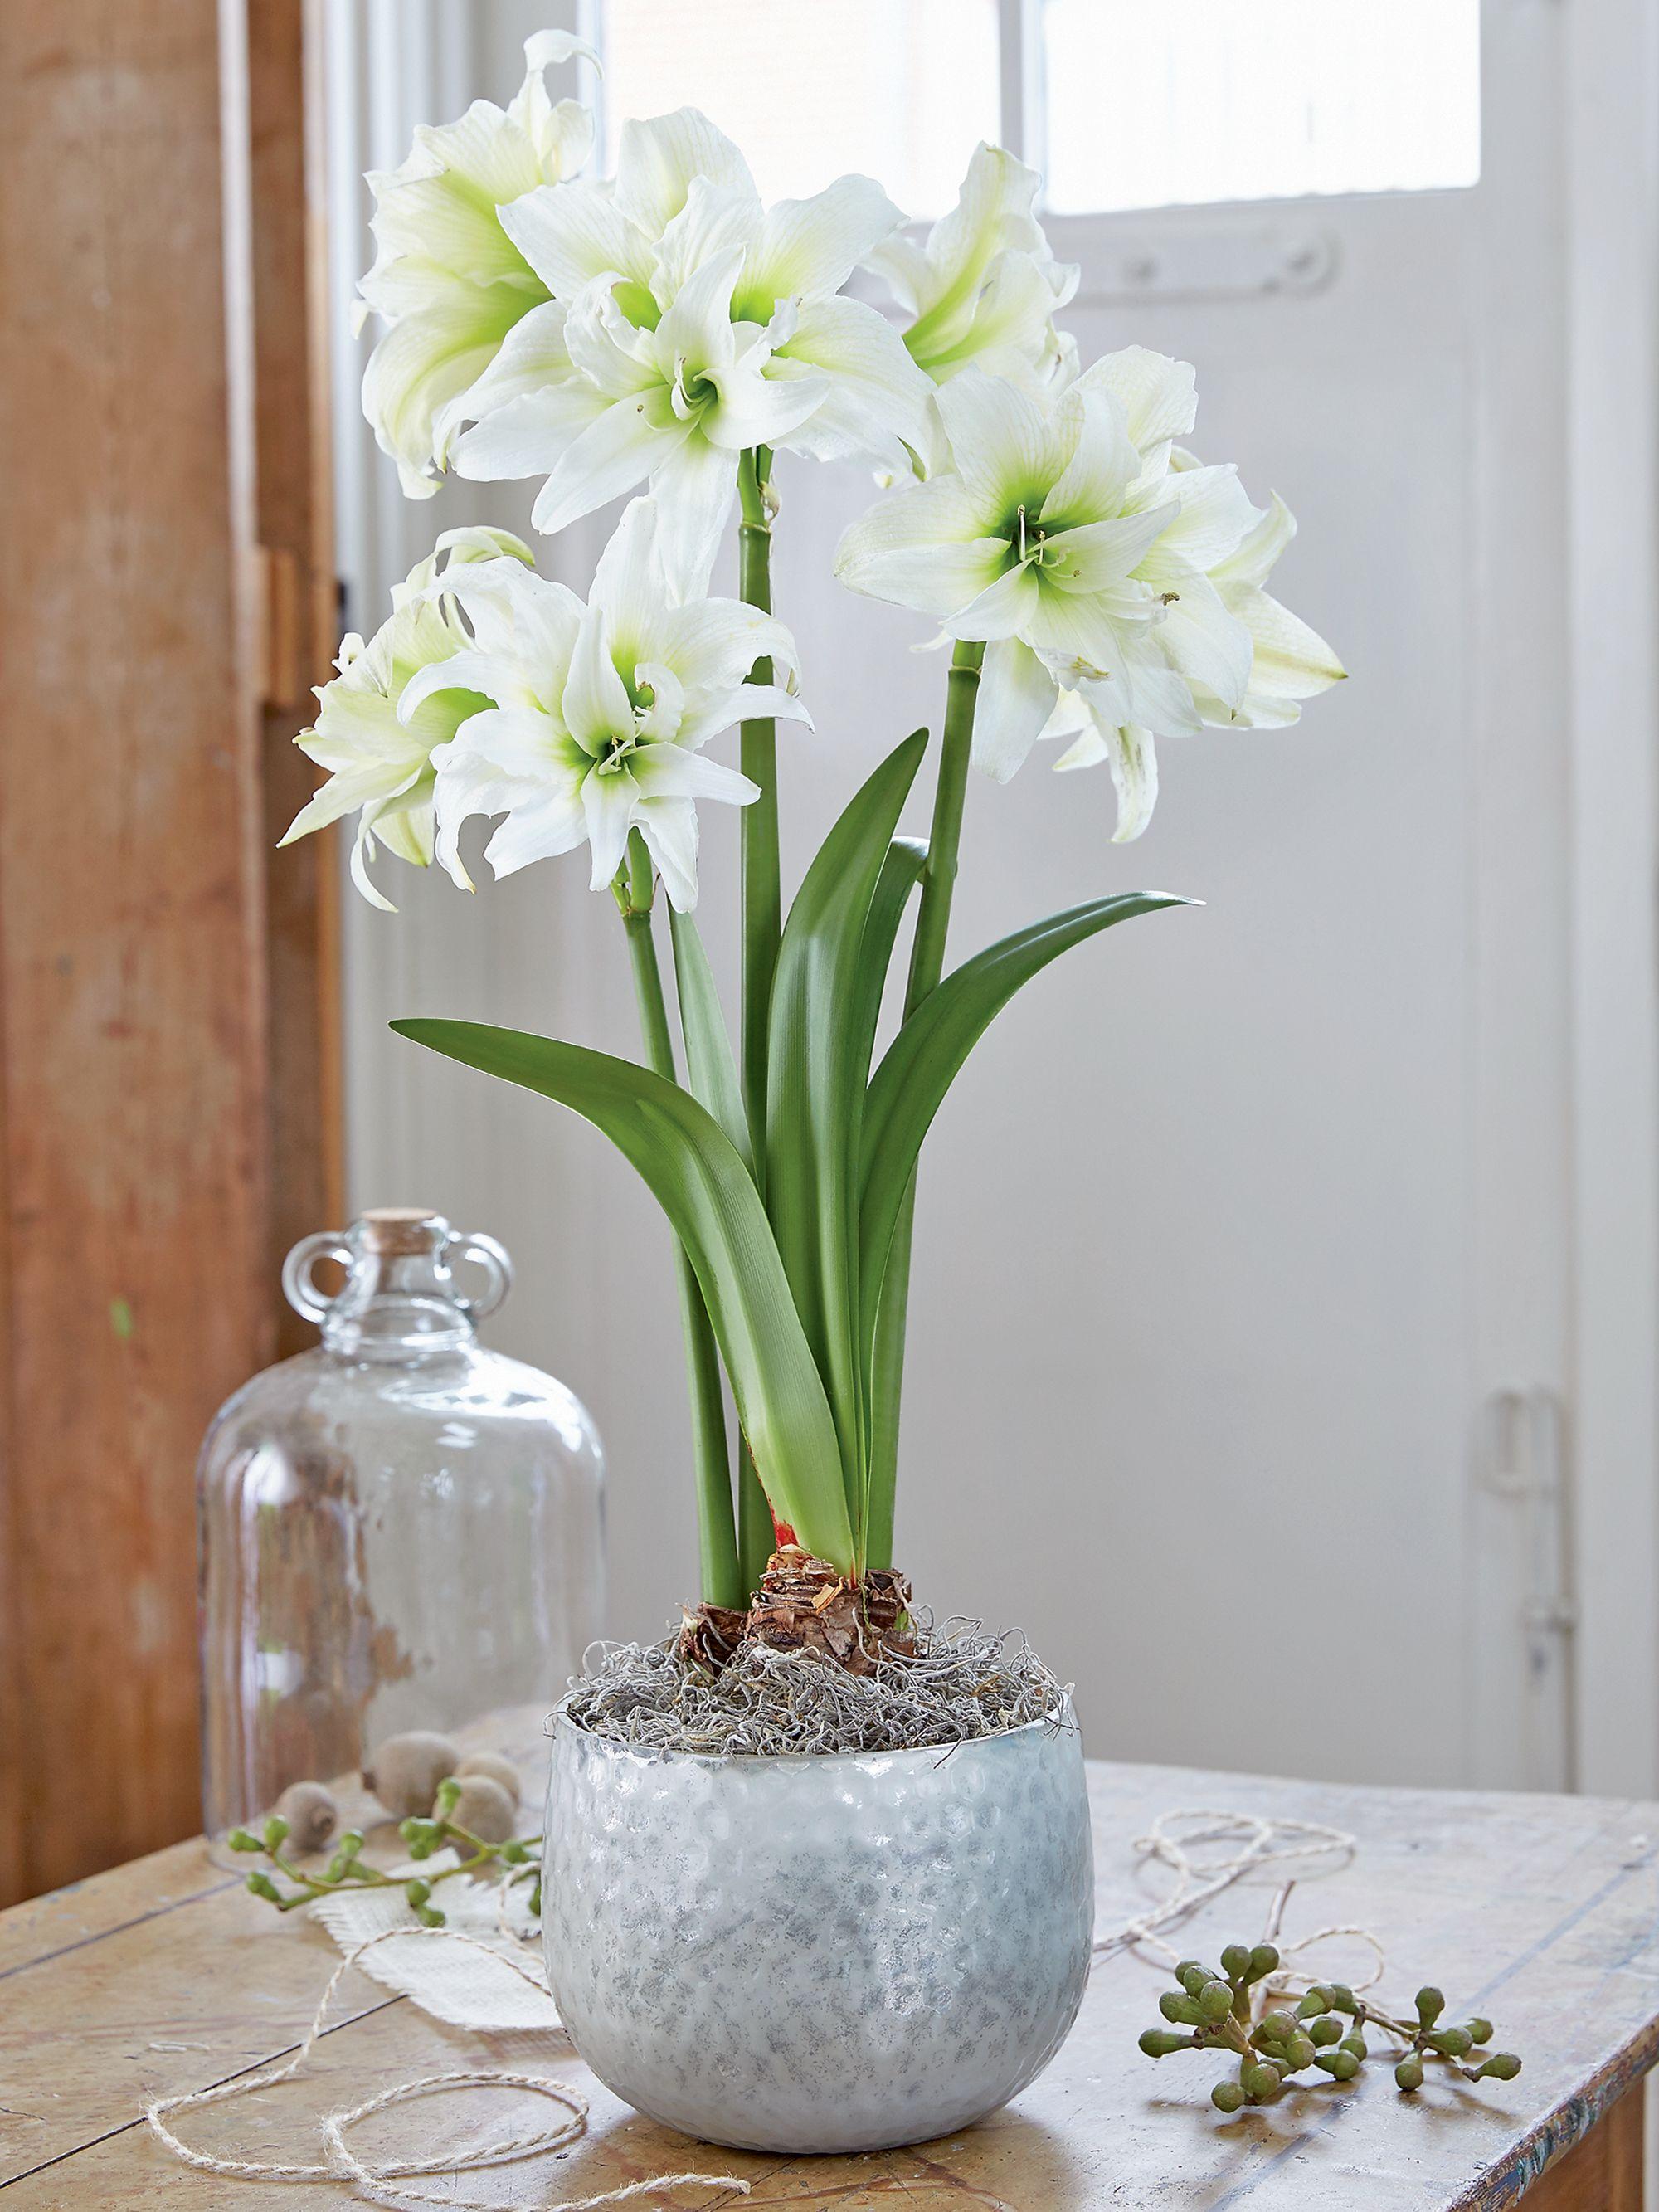 Ice Queen Potted Amaryllis Amaryllis Showy Flowers Amaryllis Bulbs